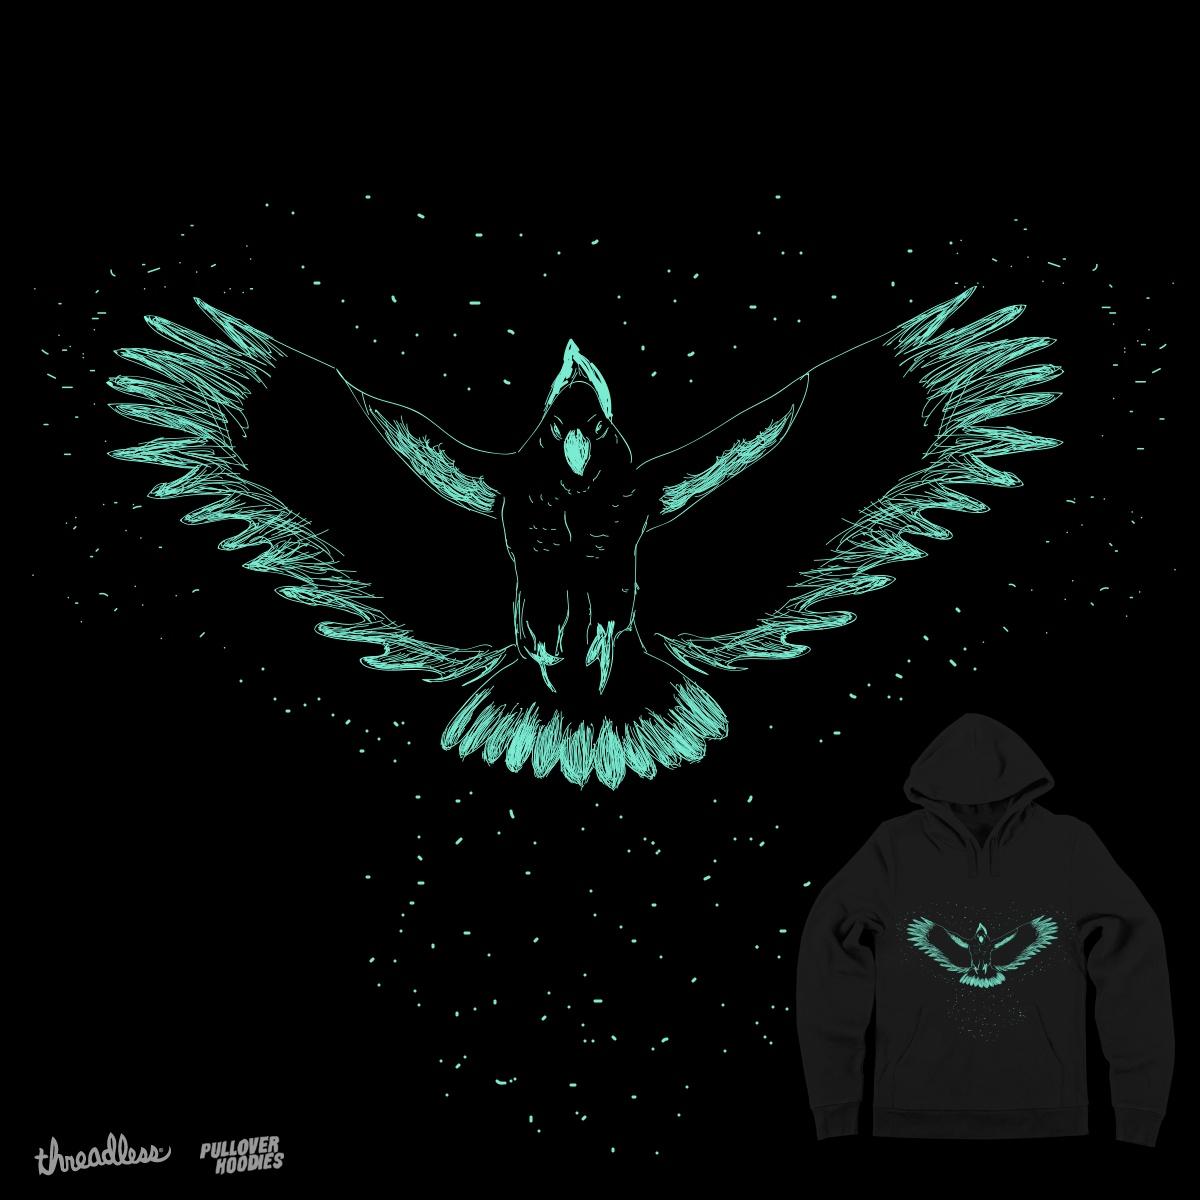 Ghost Cockatoo by CaitlinMcG4 on Threadless